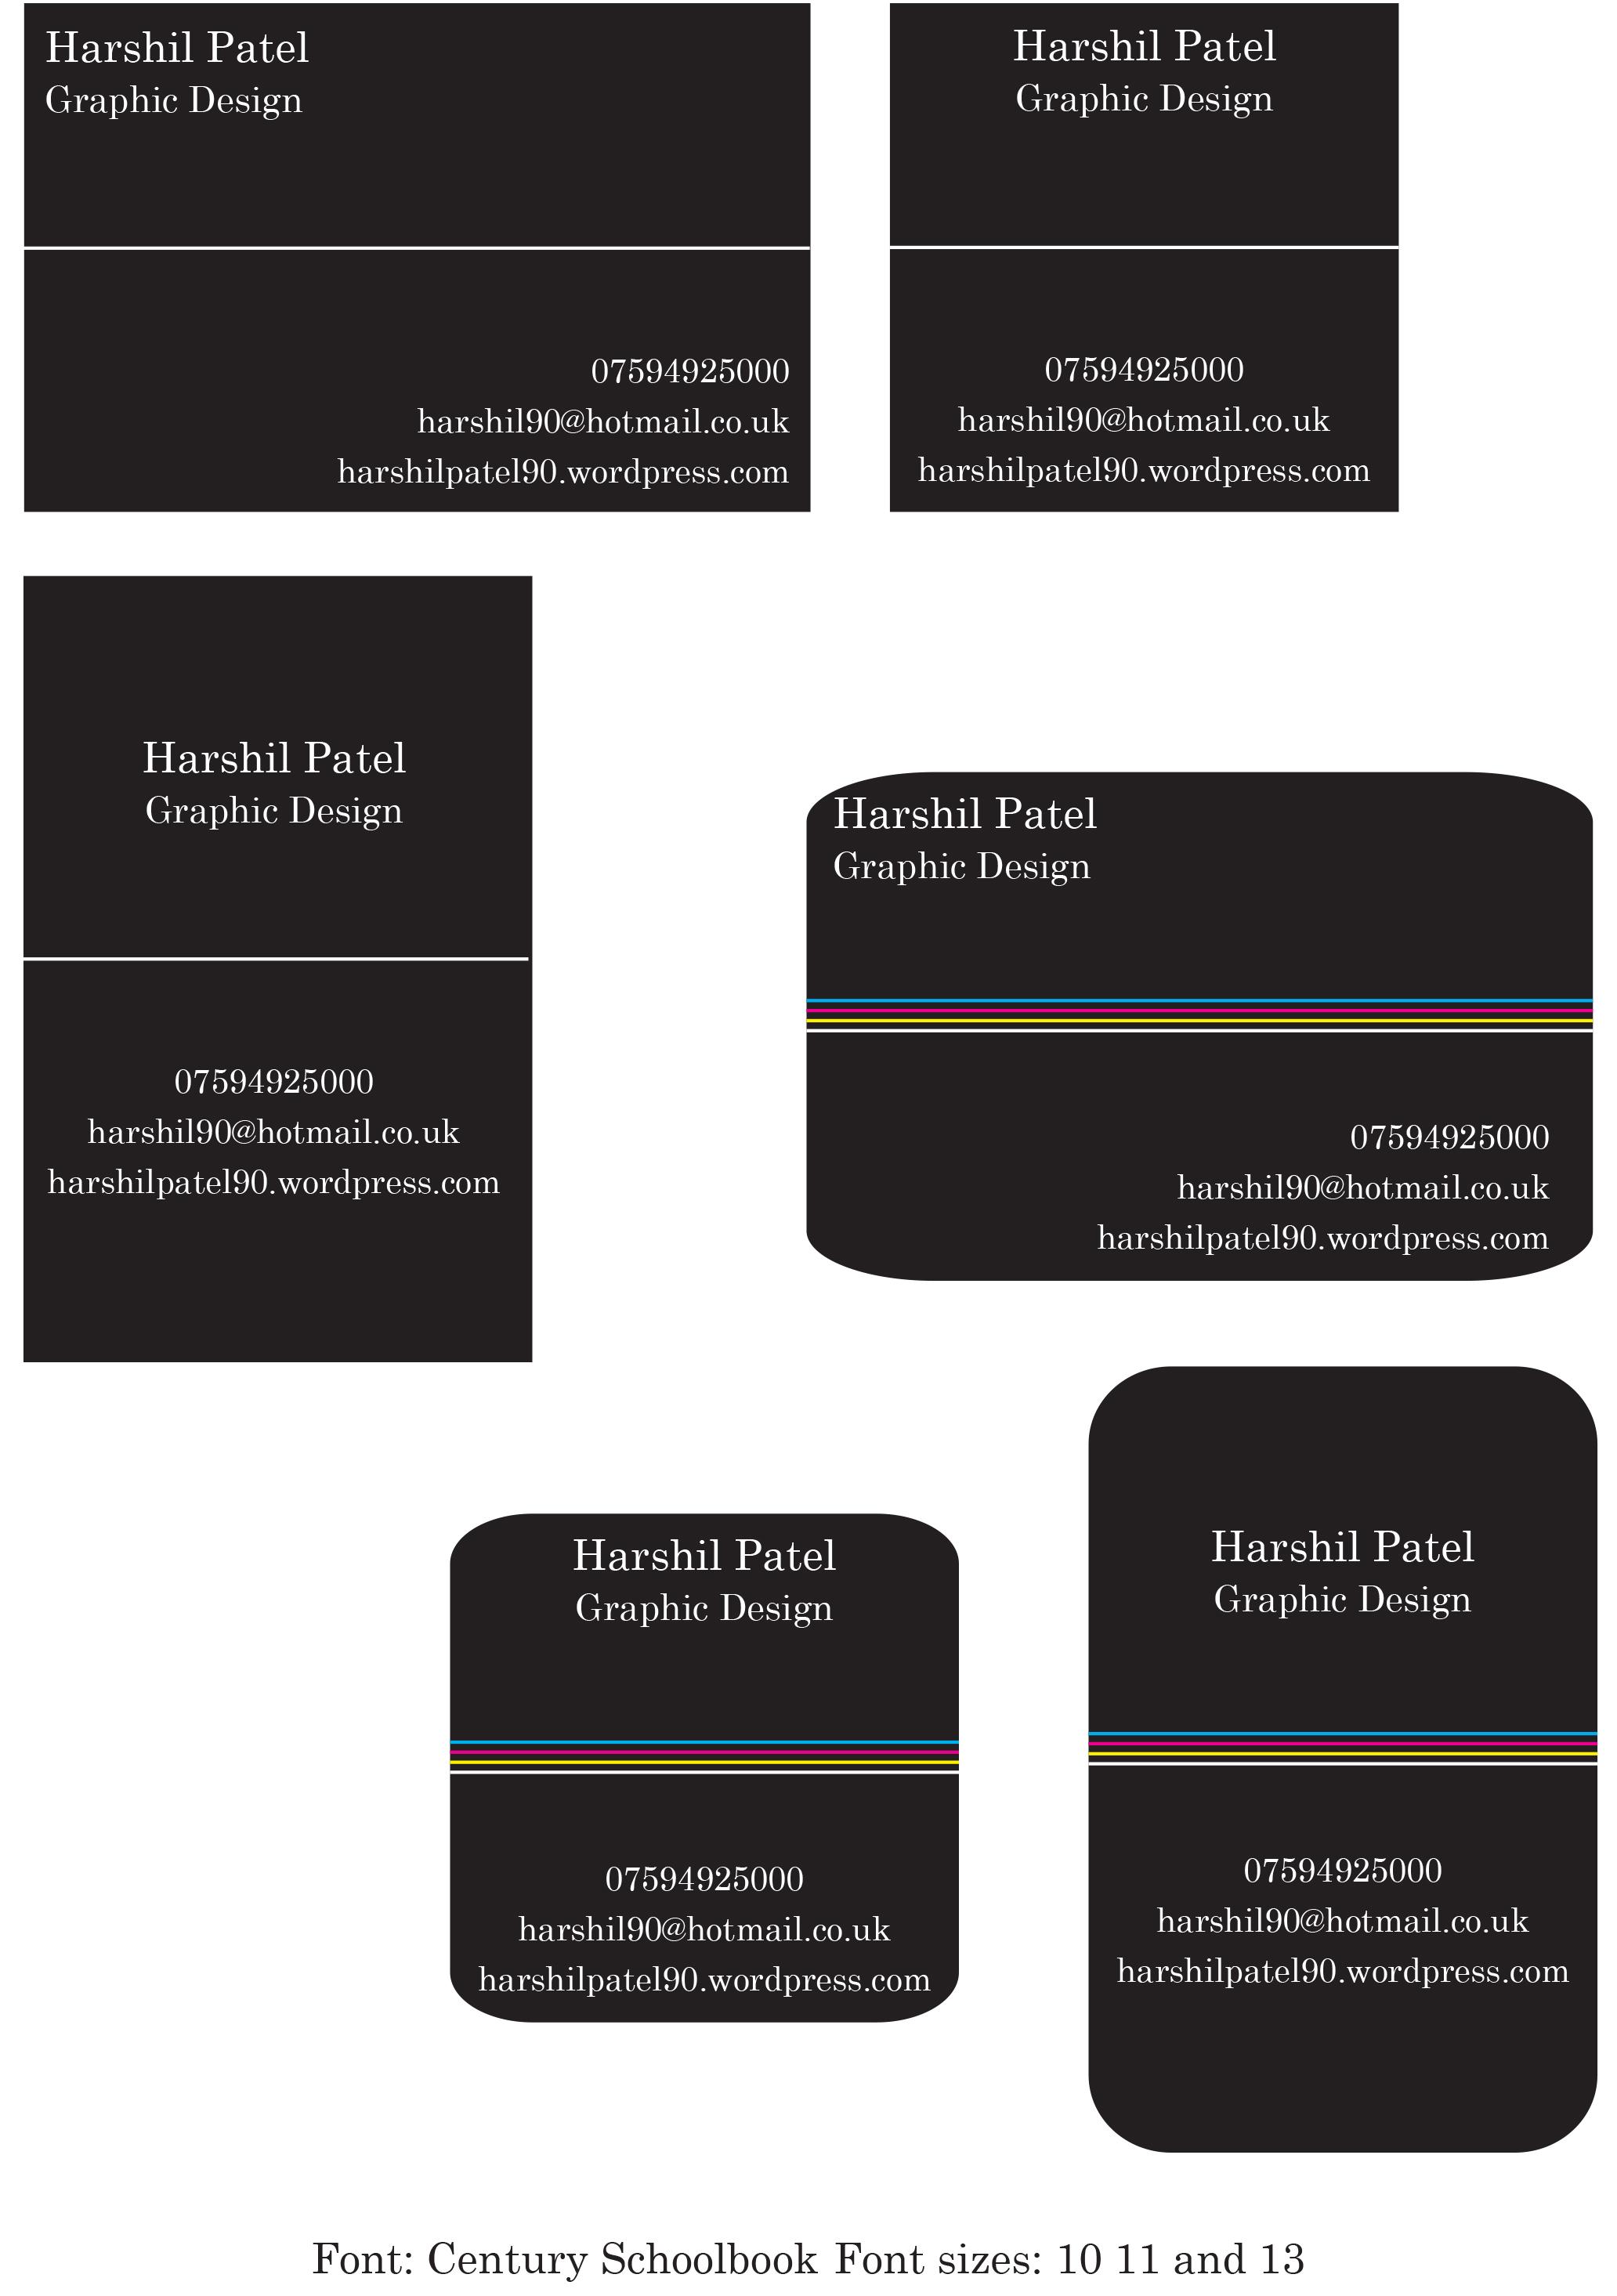 Business Card Design Ideas Project 4